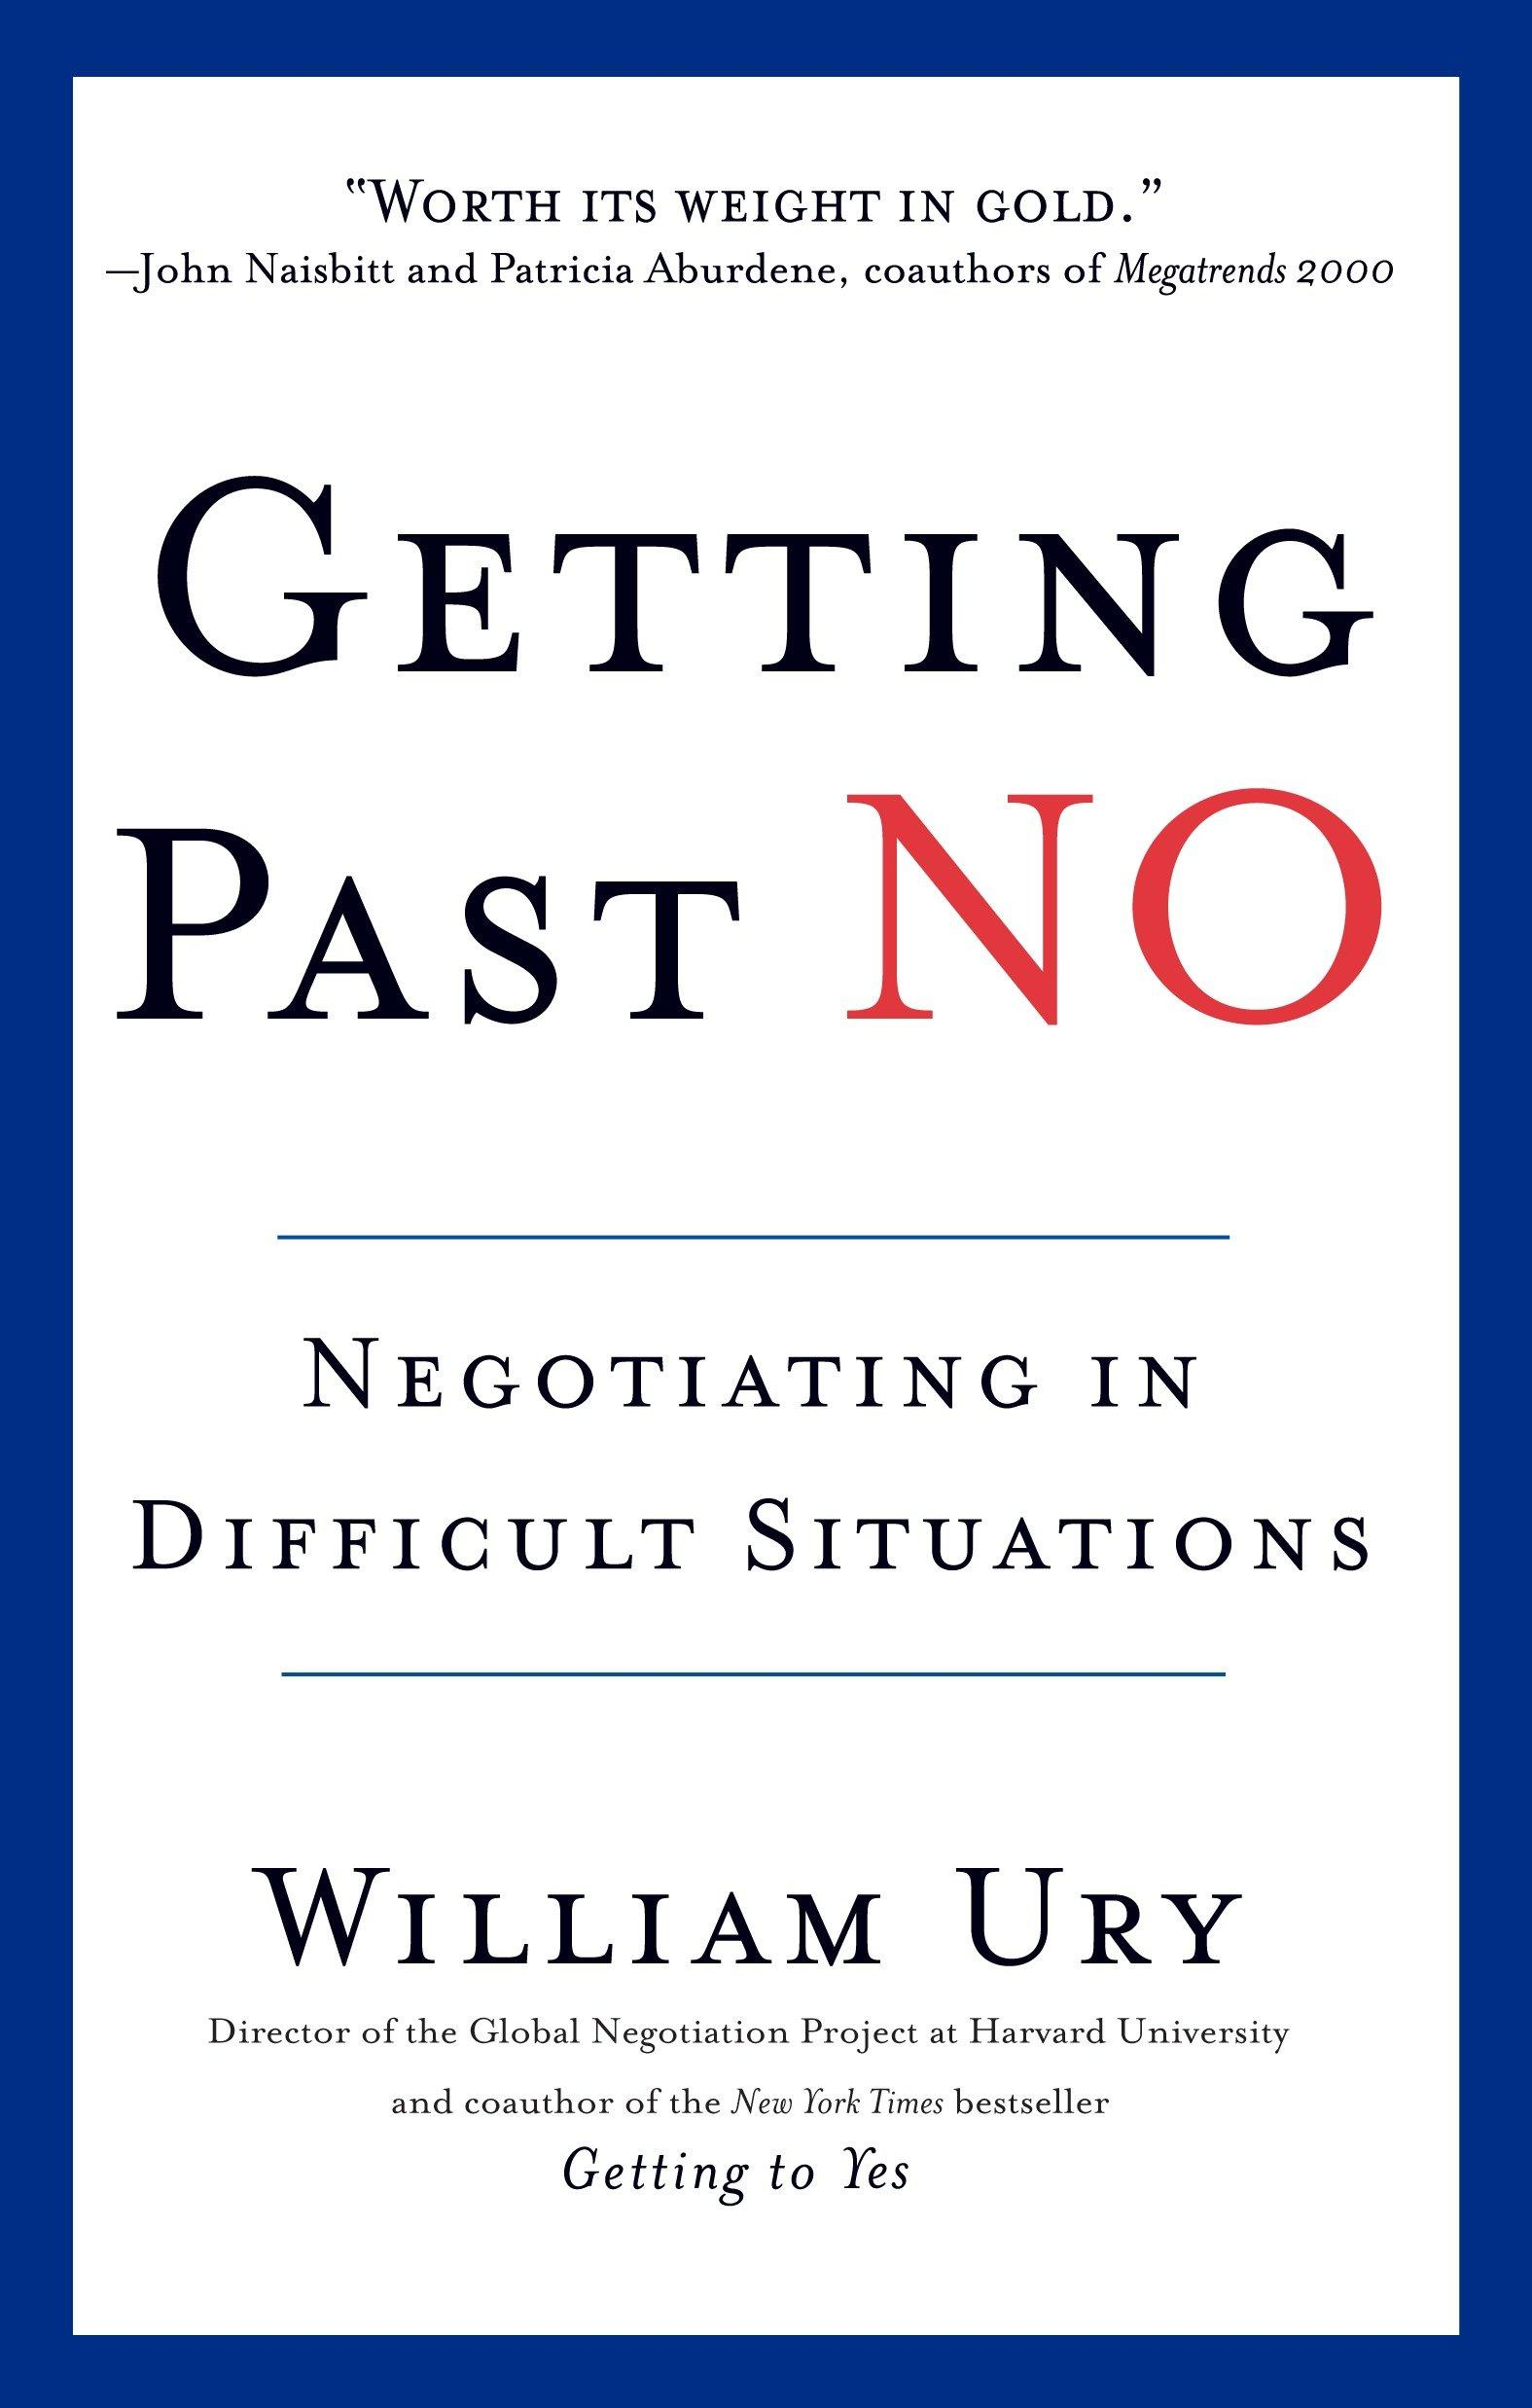 Getting Past No  Negotiating in Diffcult Situations  William Ury  Taschenbuch  Englisch  2003